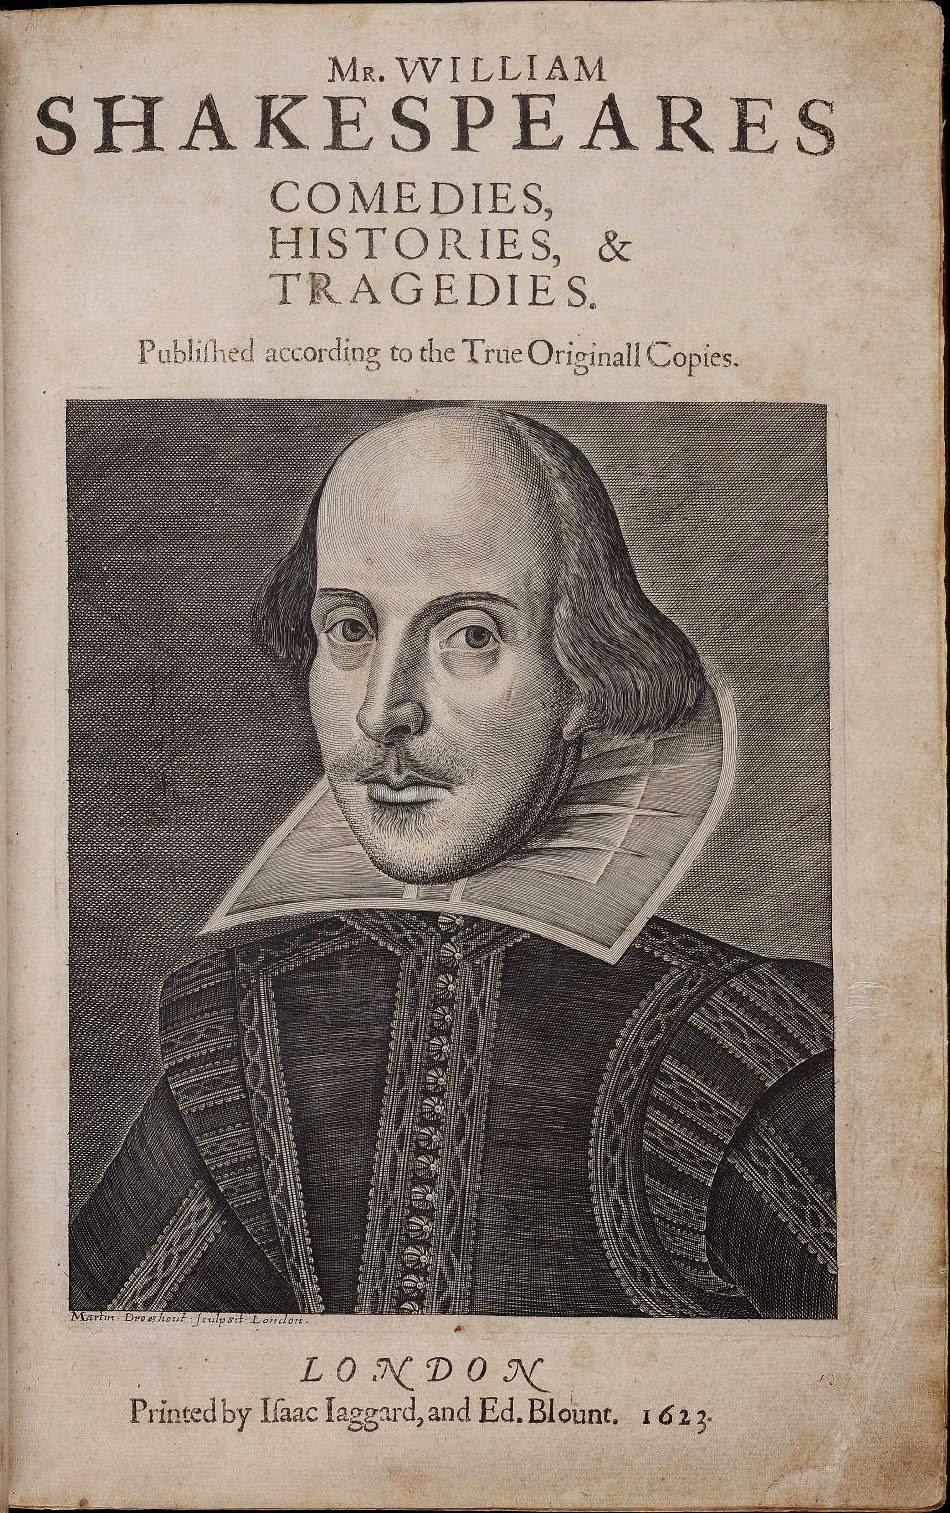 Piese teatru Shakespeare